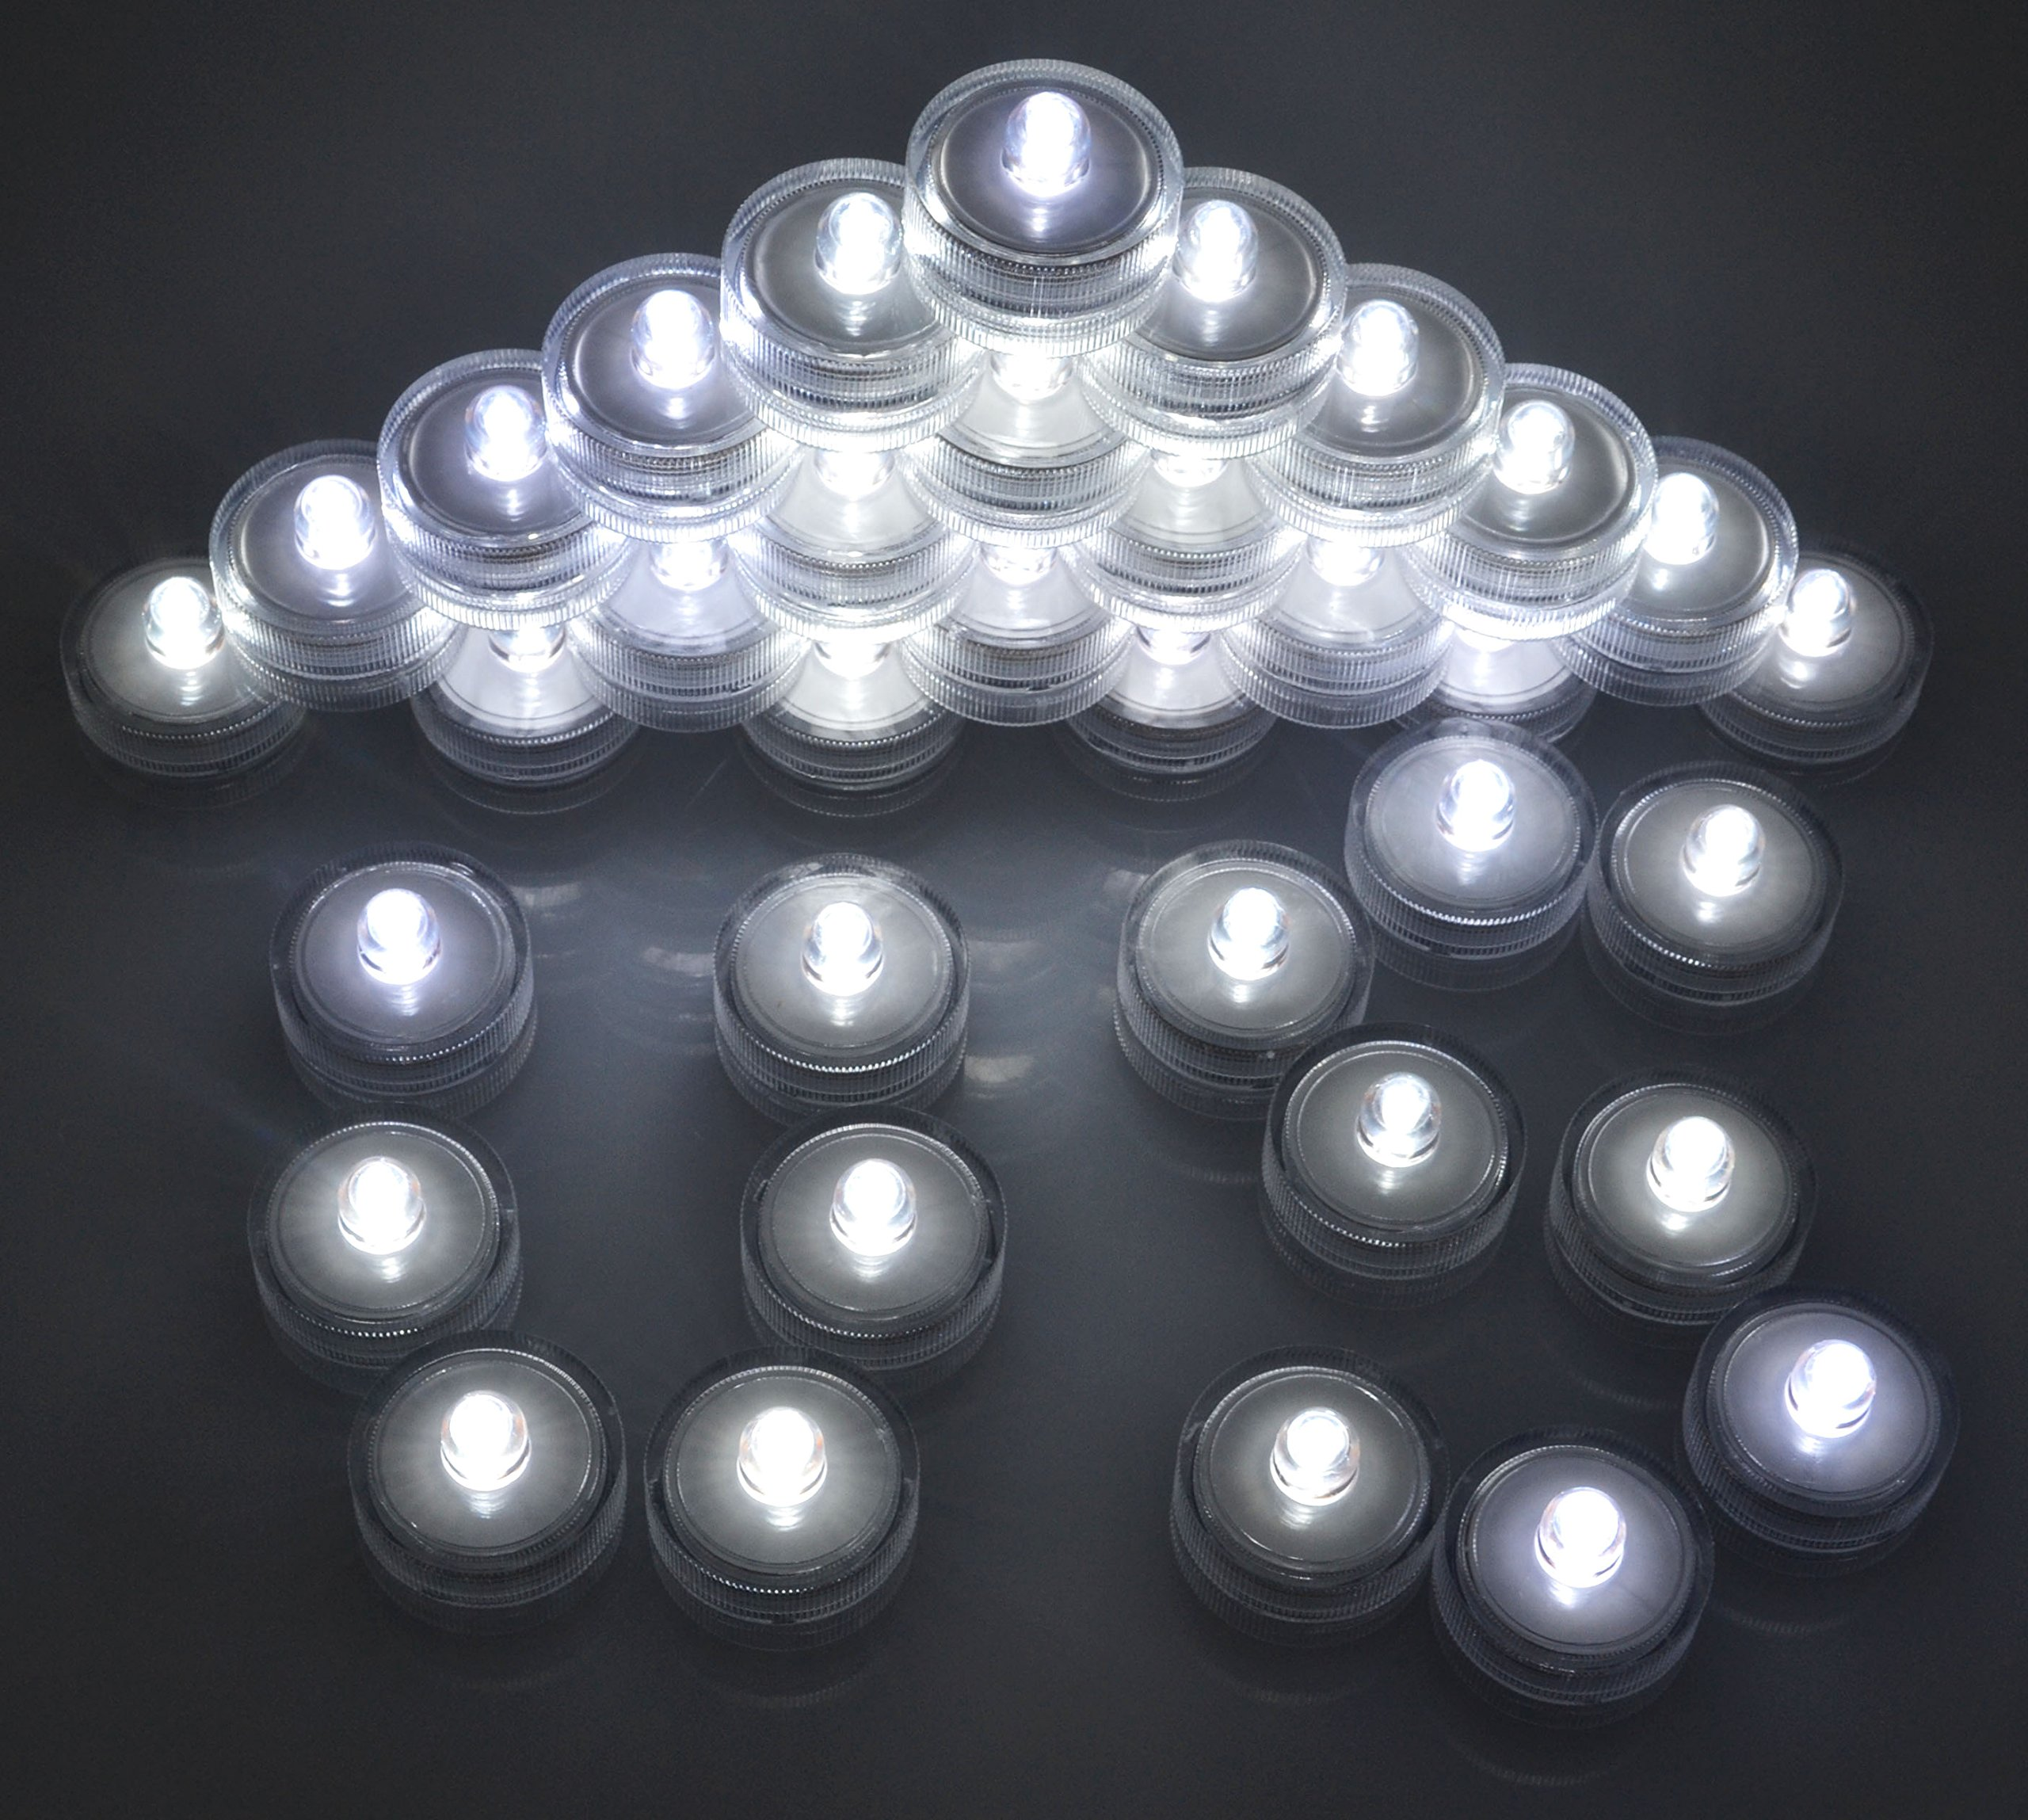 Samyo Set of 36 Waterproof Wedding Submersible Battery LED Tea Lights Underwater Sub Lights- Wedding Centerpieces Party Decorate (White) by Samyo (Image #2)